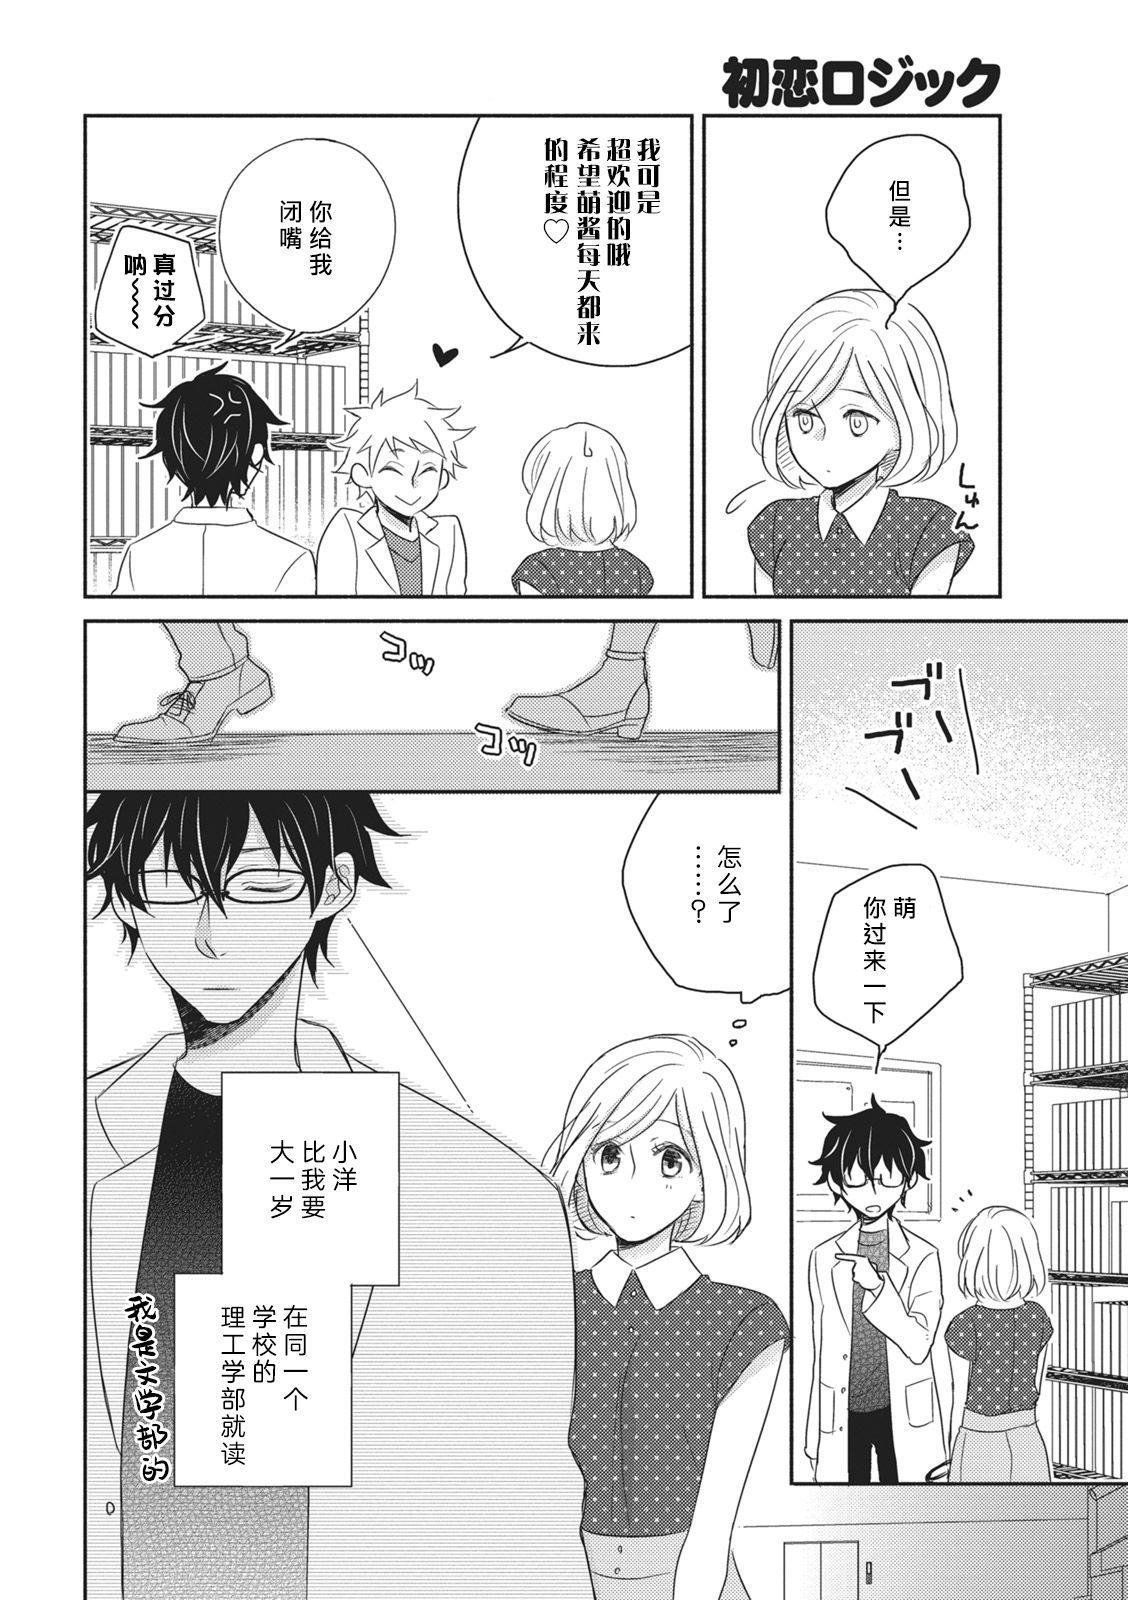 HaTsuKoi LOGIC | 初恋逻辑 3